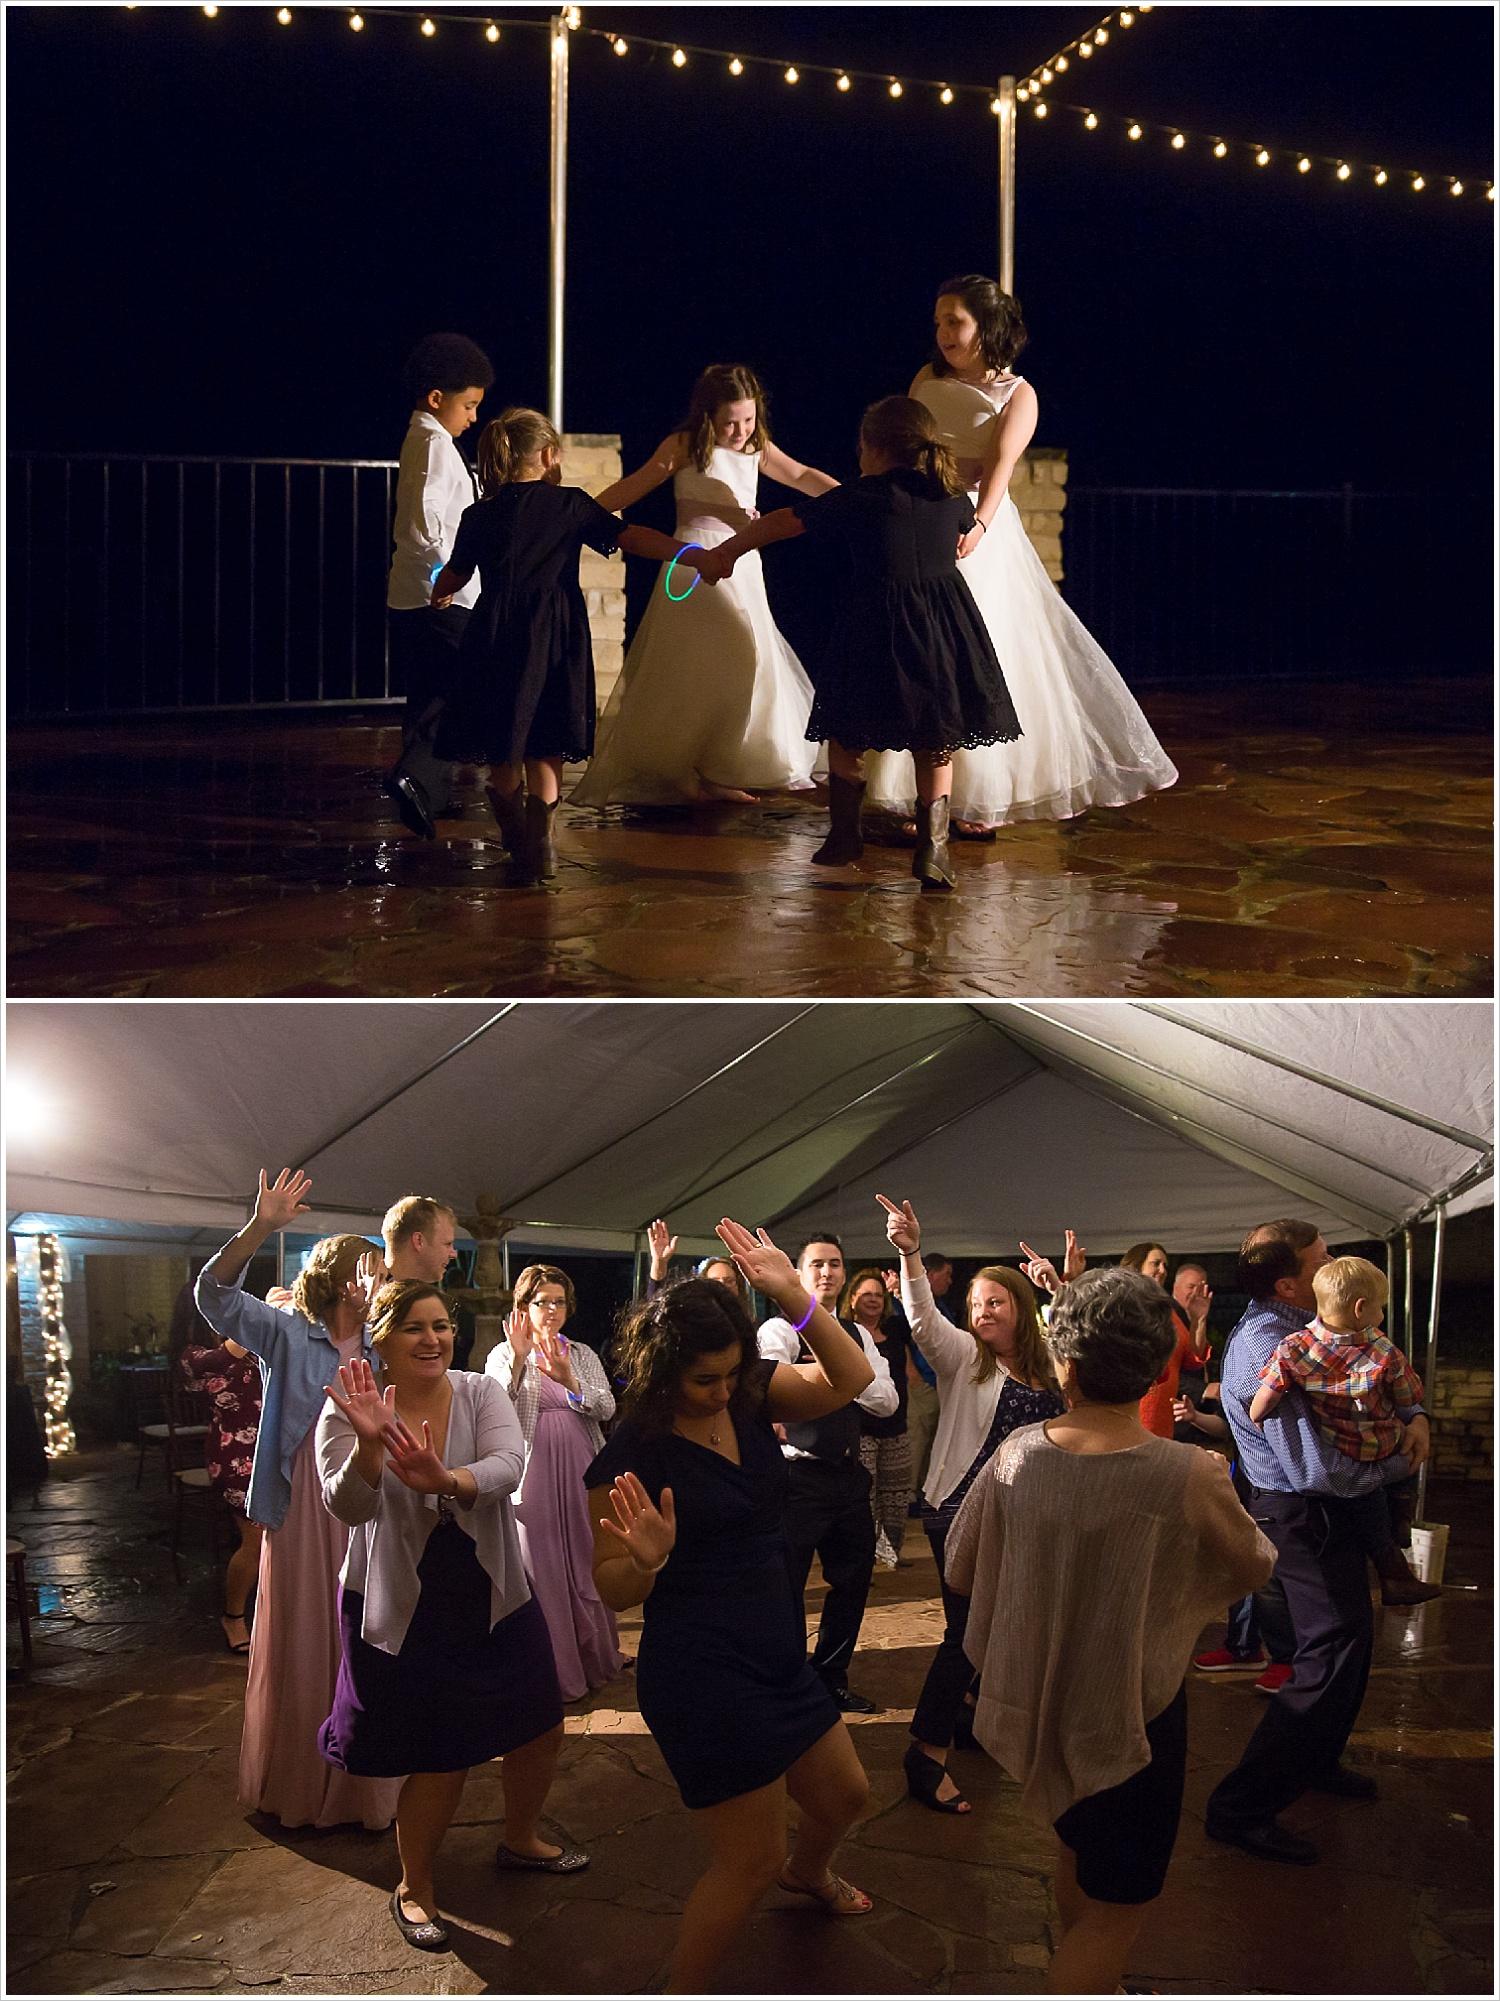 Children dance in the rain at wedding reception at La Rio Mansion